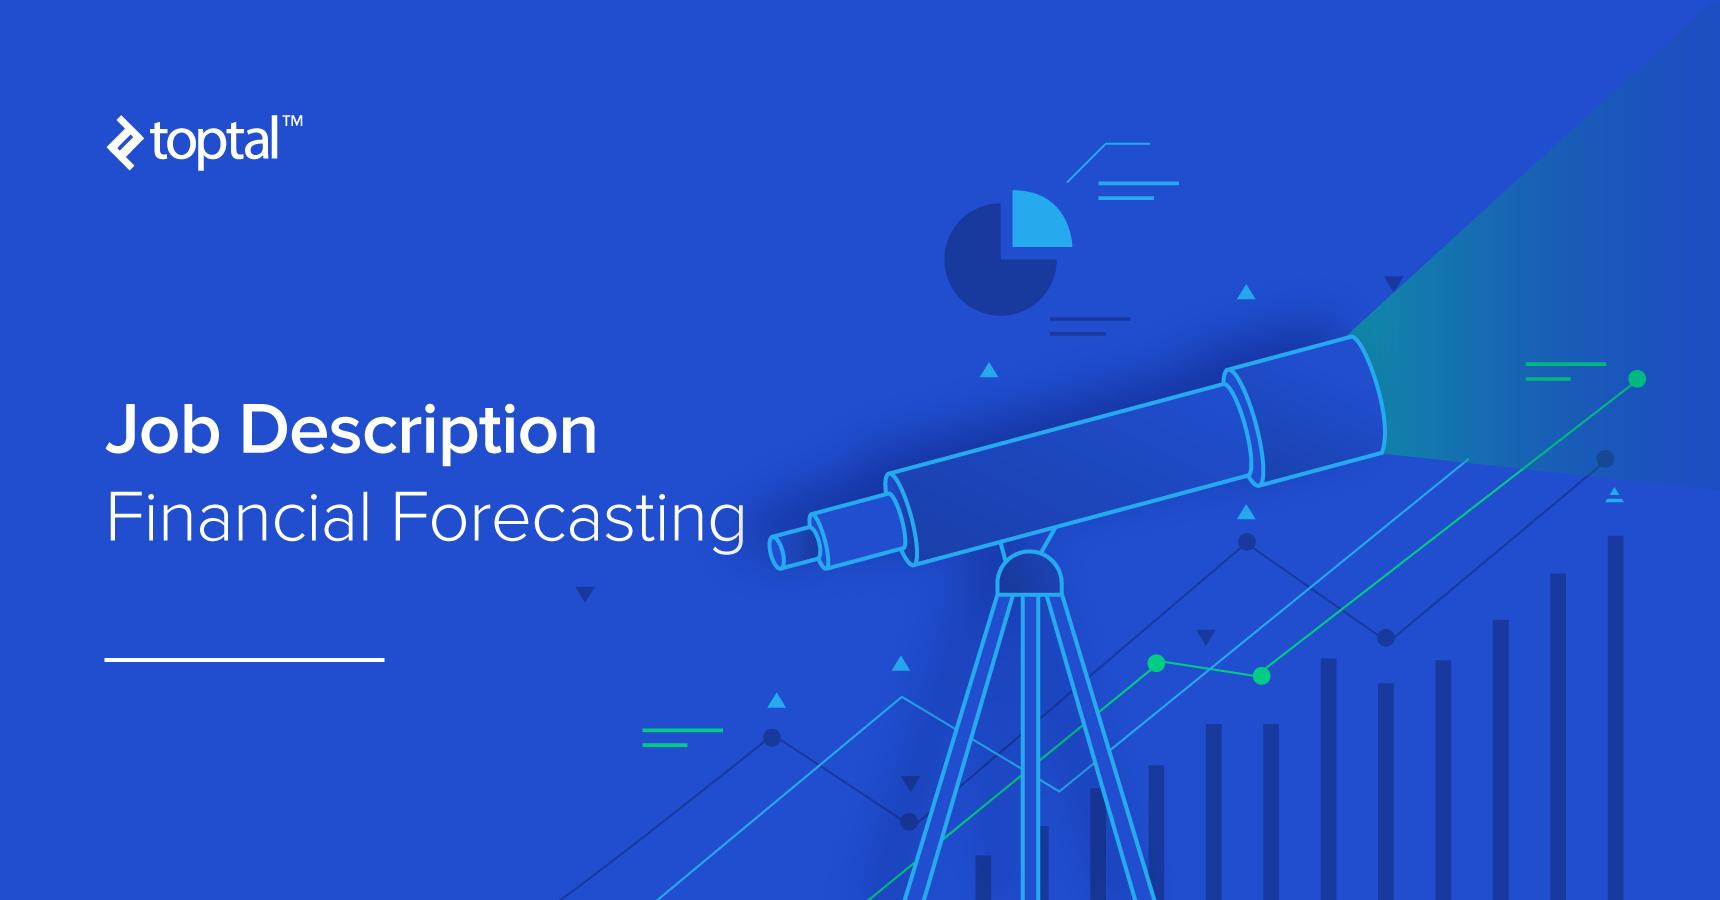 Financial Forecasting Expert – Job Description Template